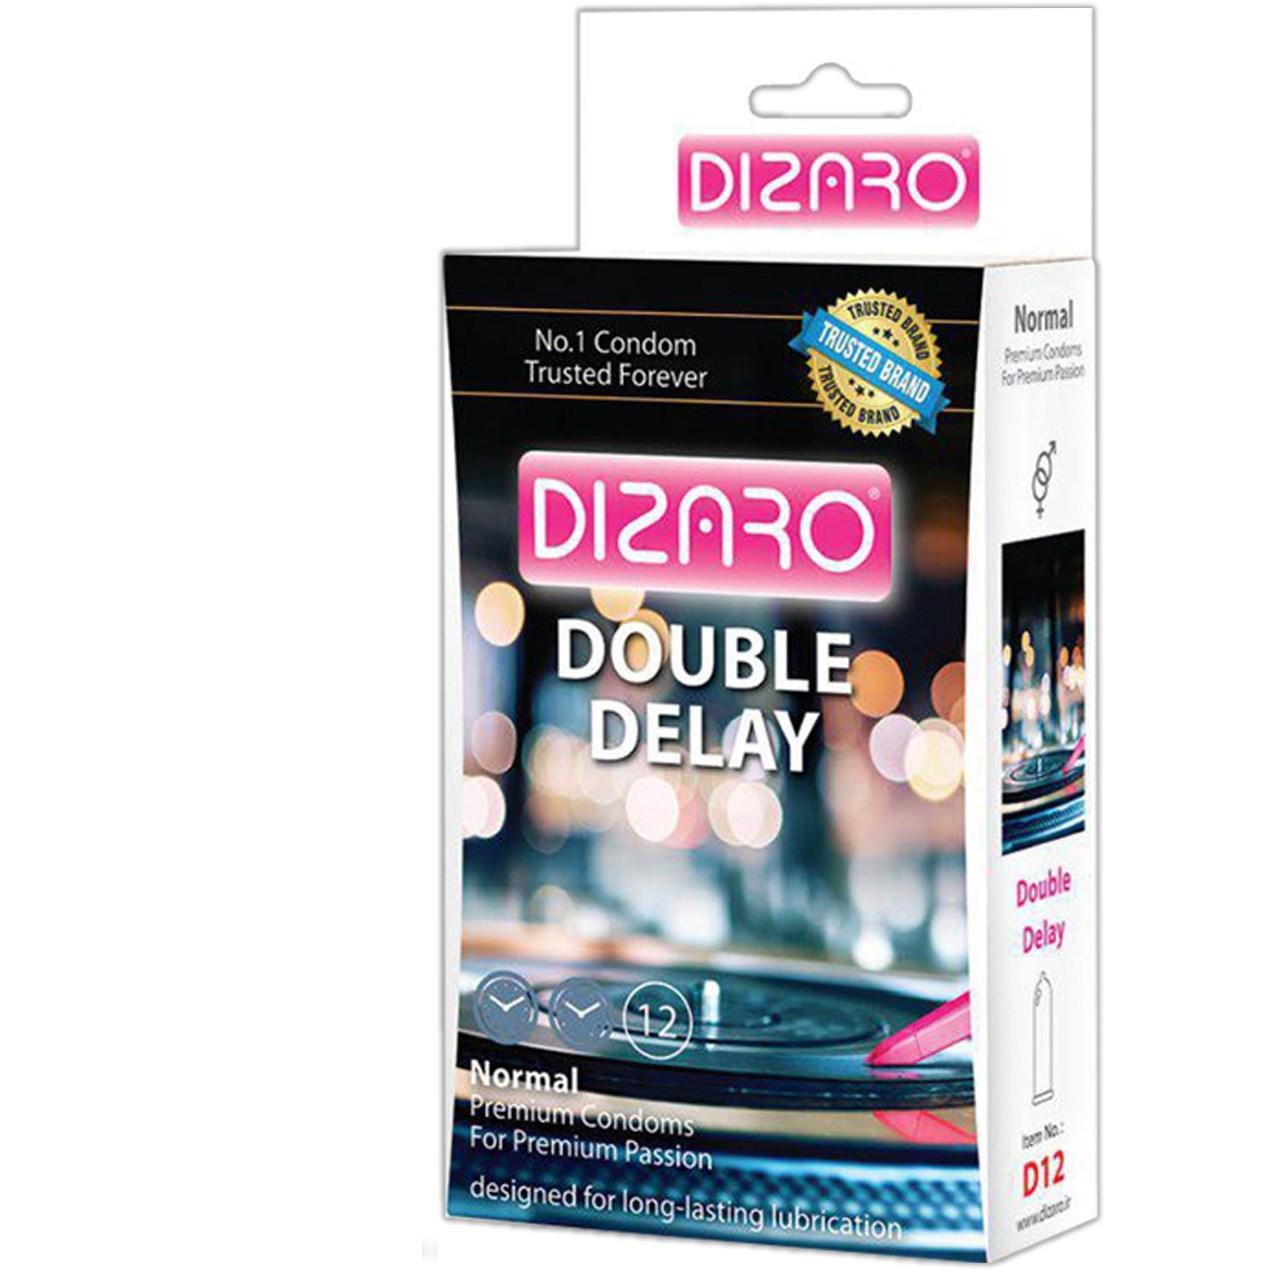 کاندوم دیزارو مدل CLASSIC DOBLE DELAY کد D12 بسته 12 عددی